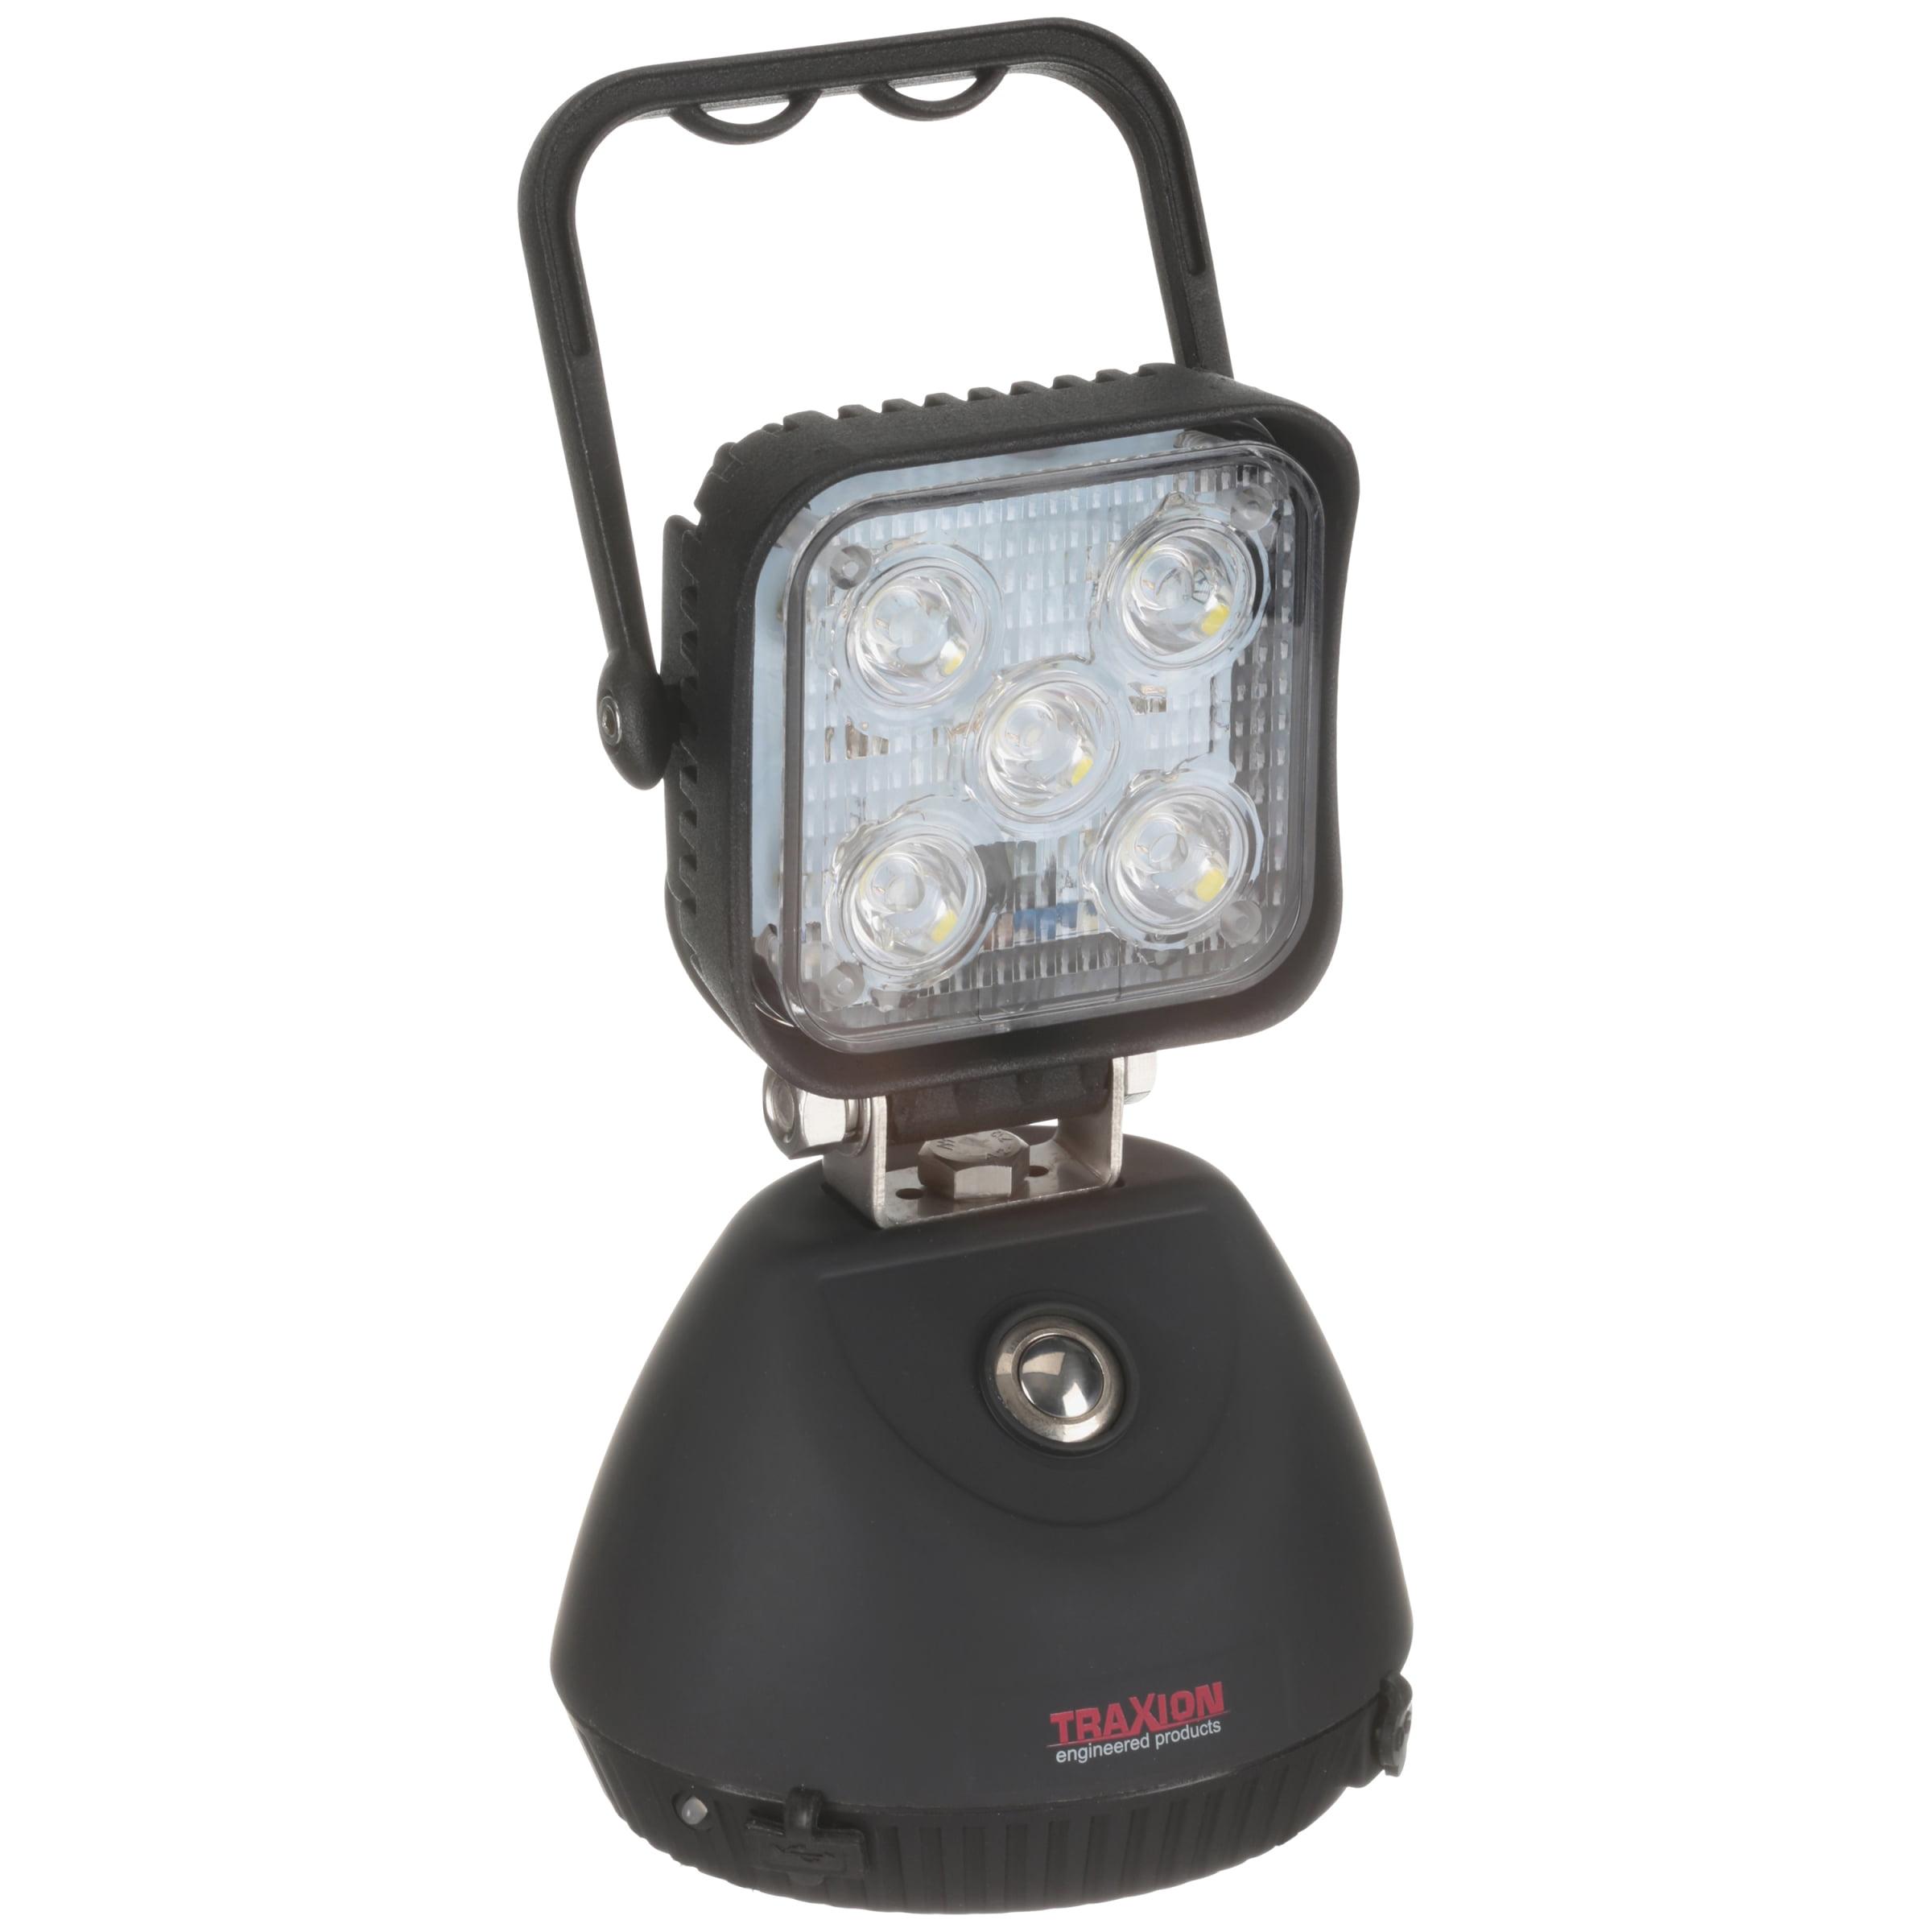 Traxion Utility Light With Bonus Charging Station 3 Pc Box